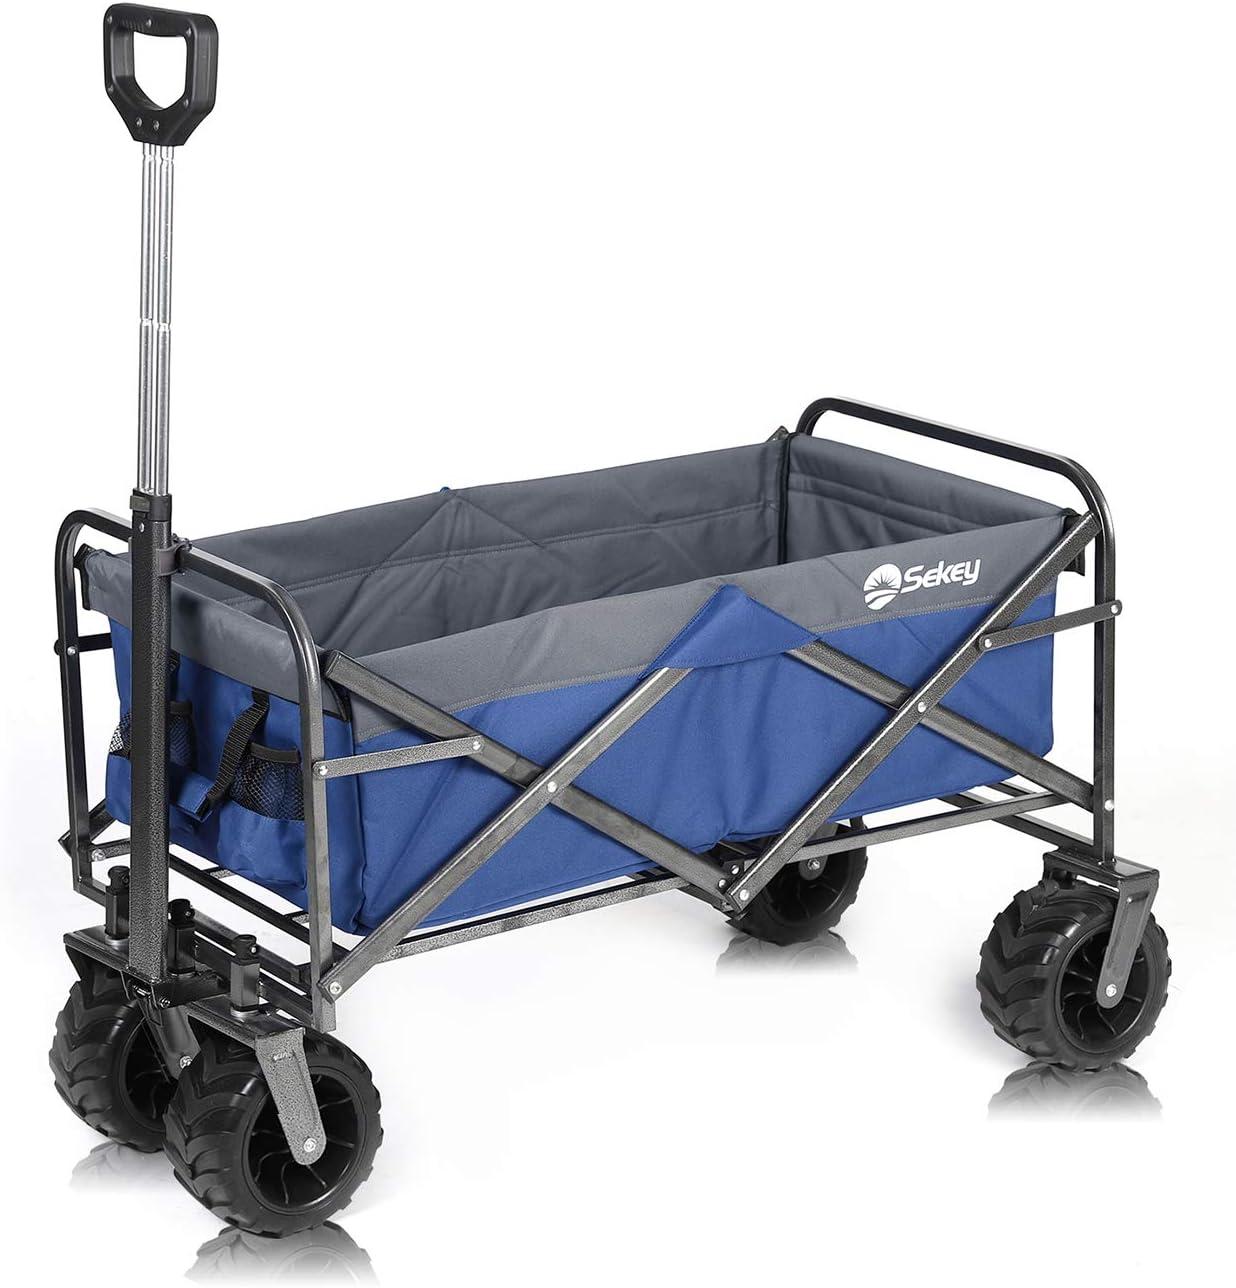 Sekey Carro Plegable Carro de Mano Carrito Playa Carro Transporte para Jardín hasta 120kg 360° Giratorio Apto para Todo Terreno, Gris Azul